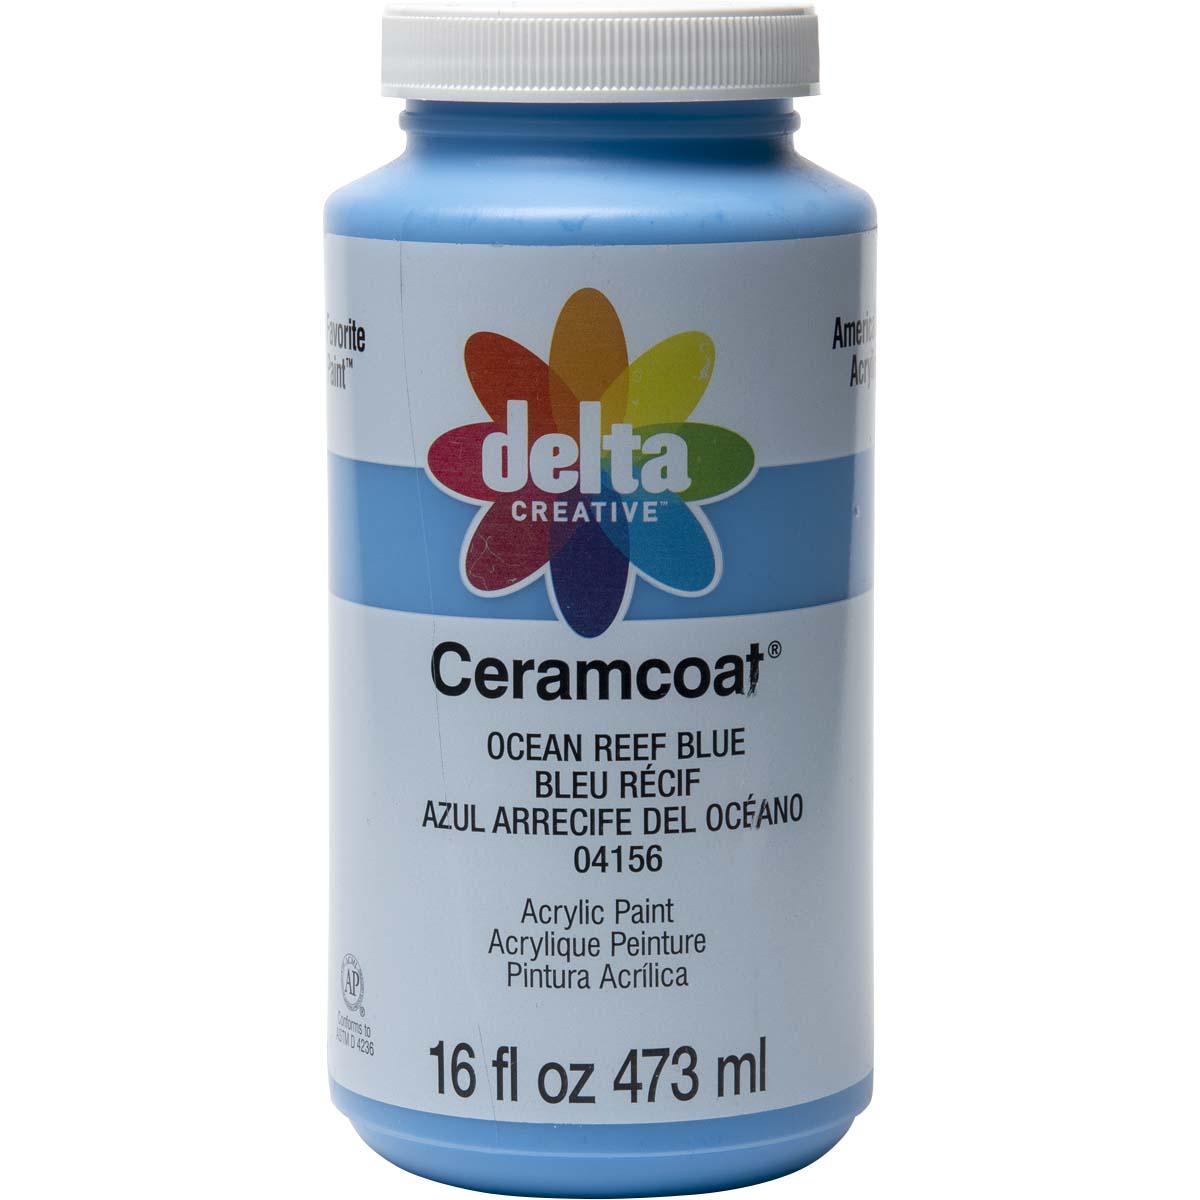 Delta Ceramcoat ® Acrylic Paint - Ocean Reef Blue, 16 oz.